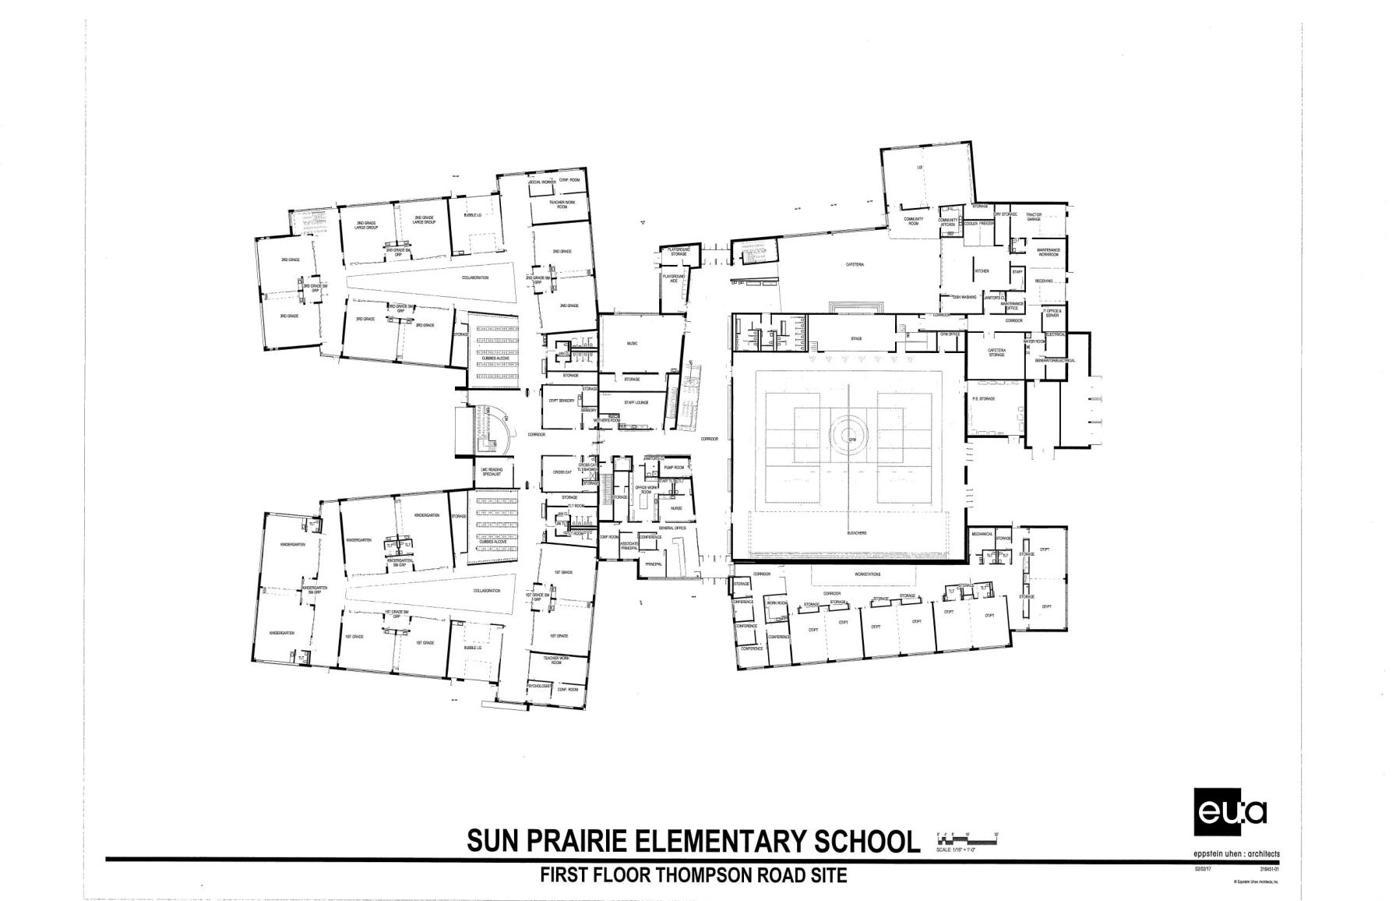 thompson road preliminary floor plan 2-6-17.pdf